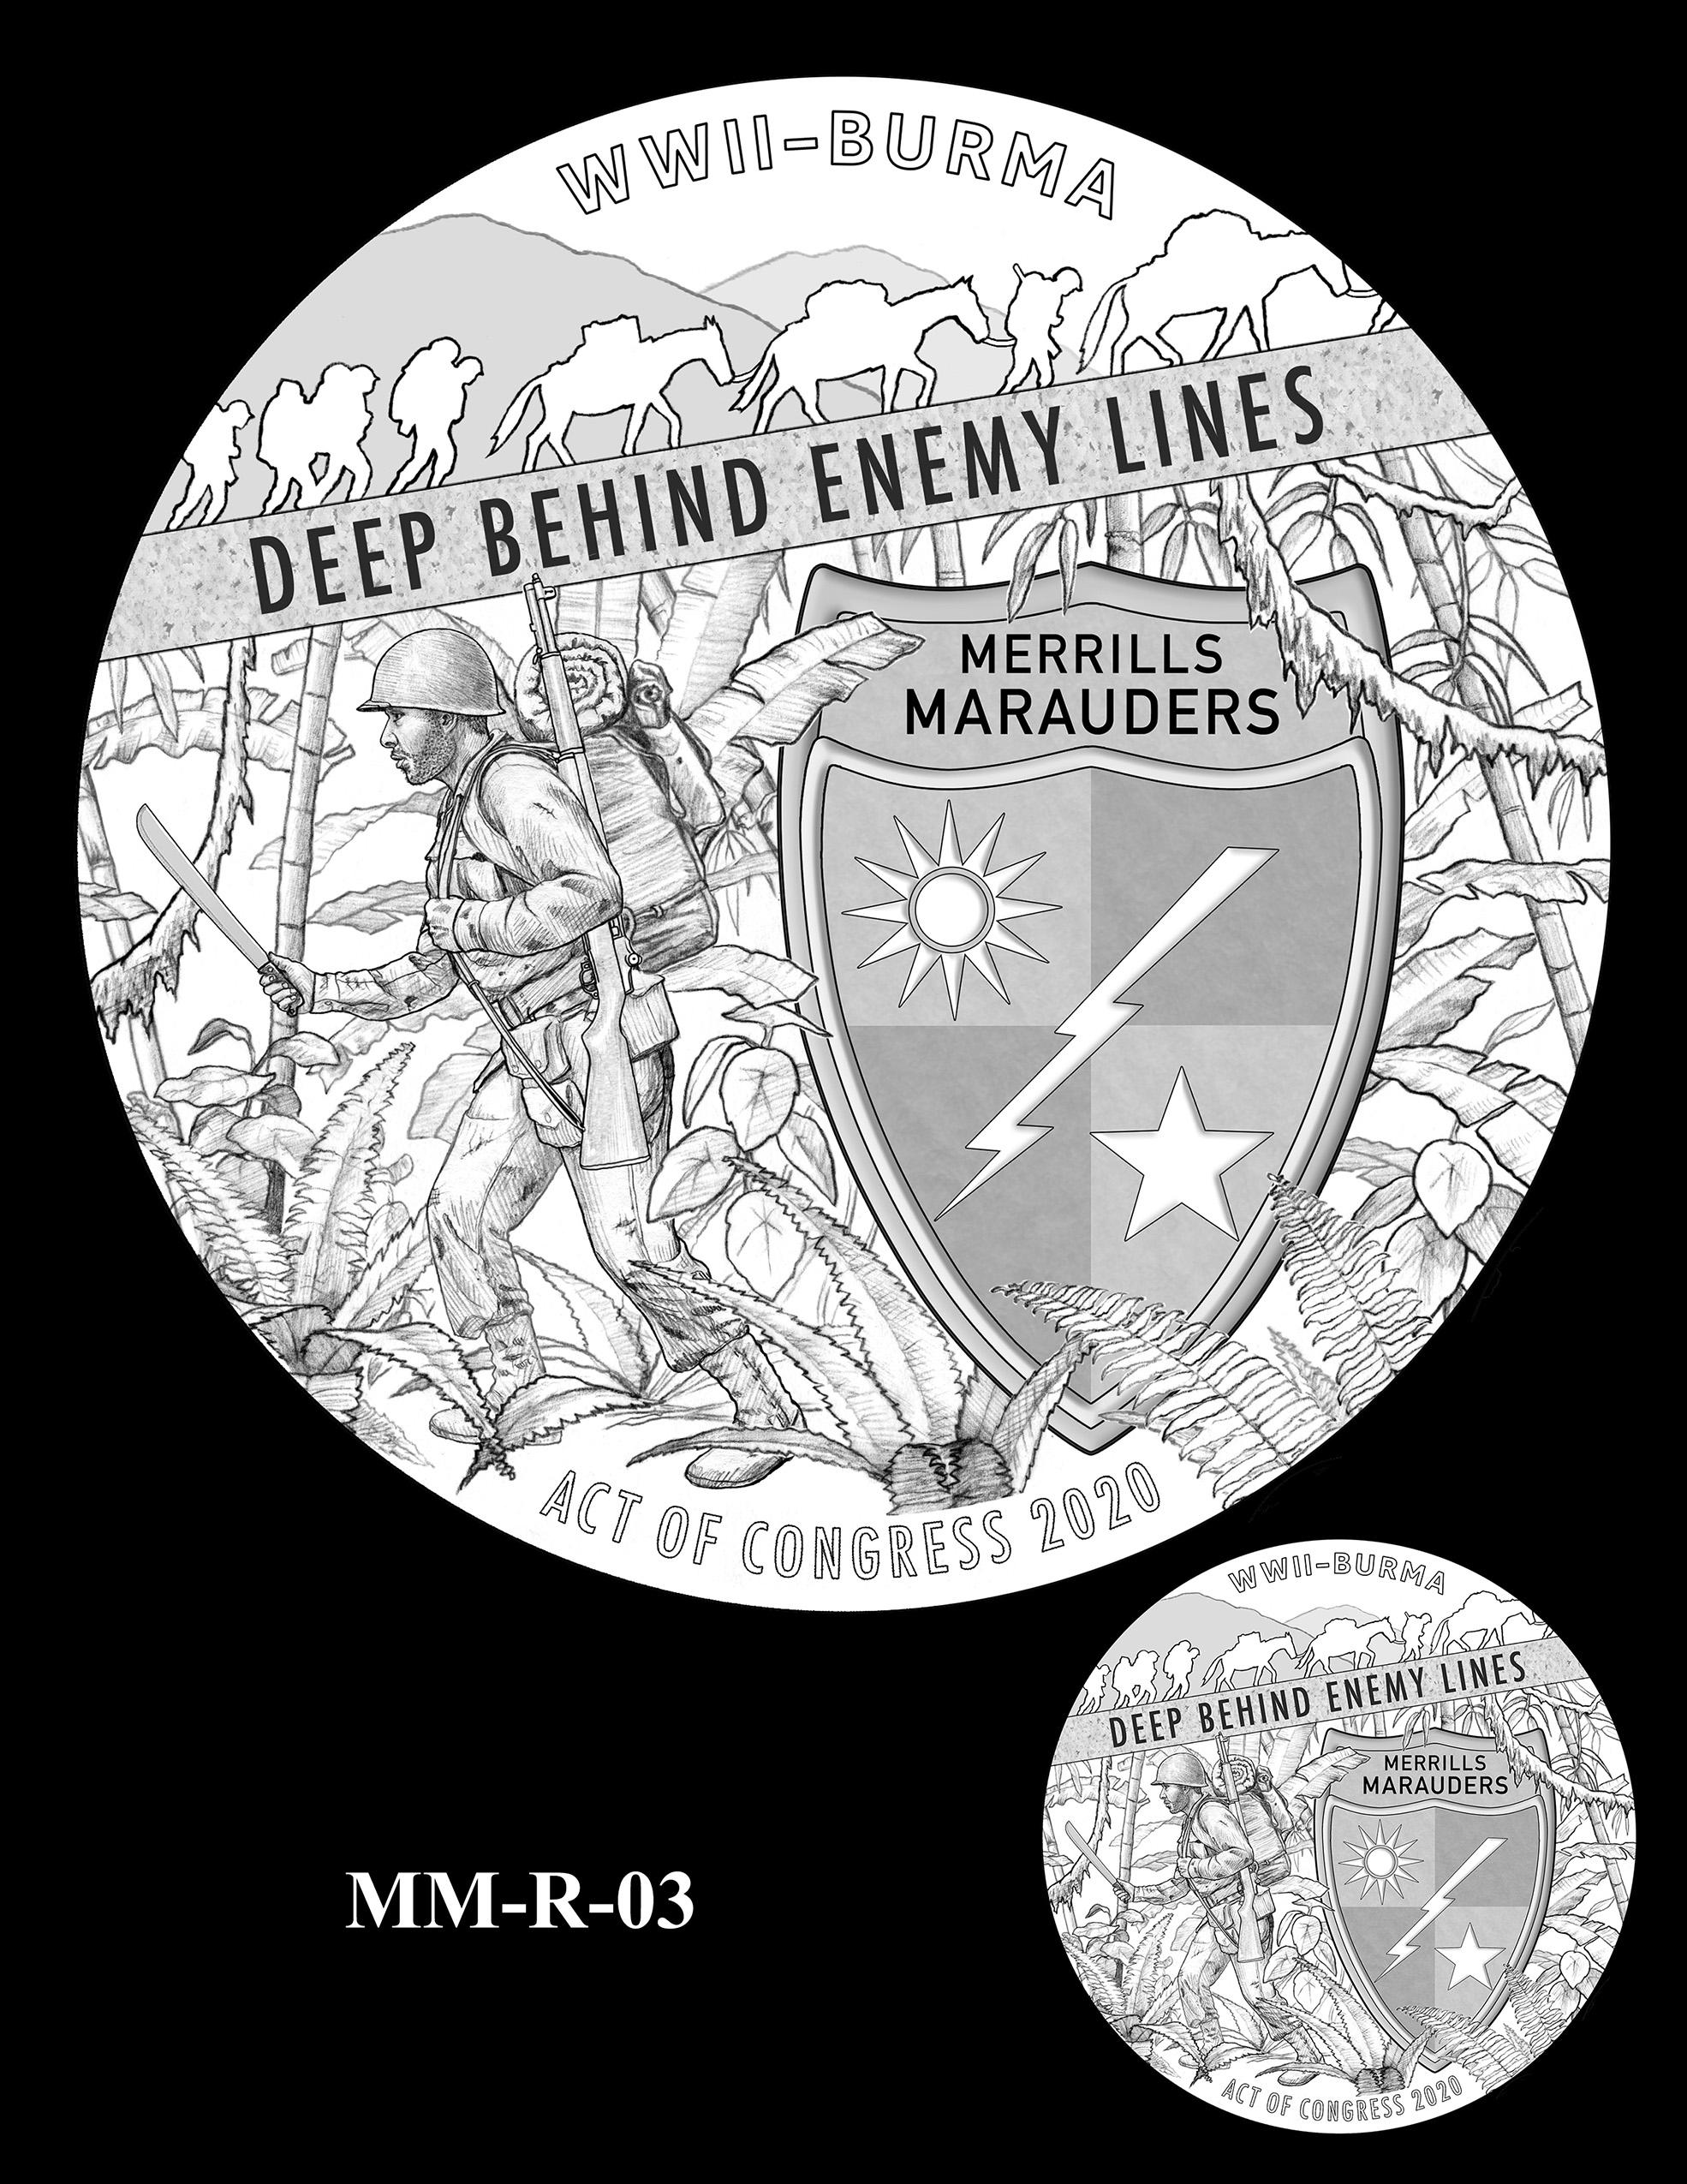 MM-R-03 -- Merrill's Marauders Congressional Gold Medal